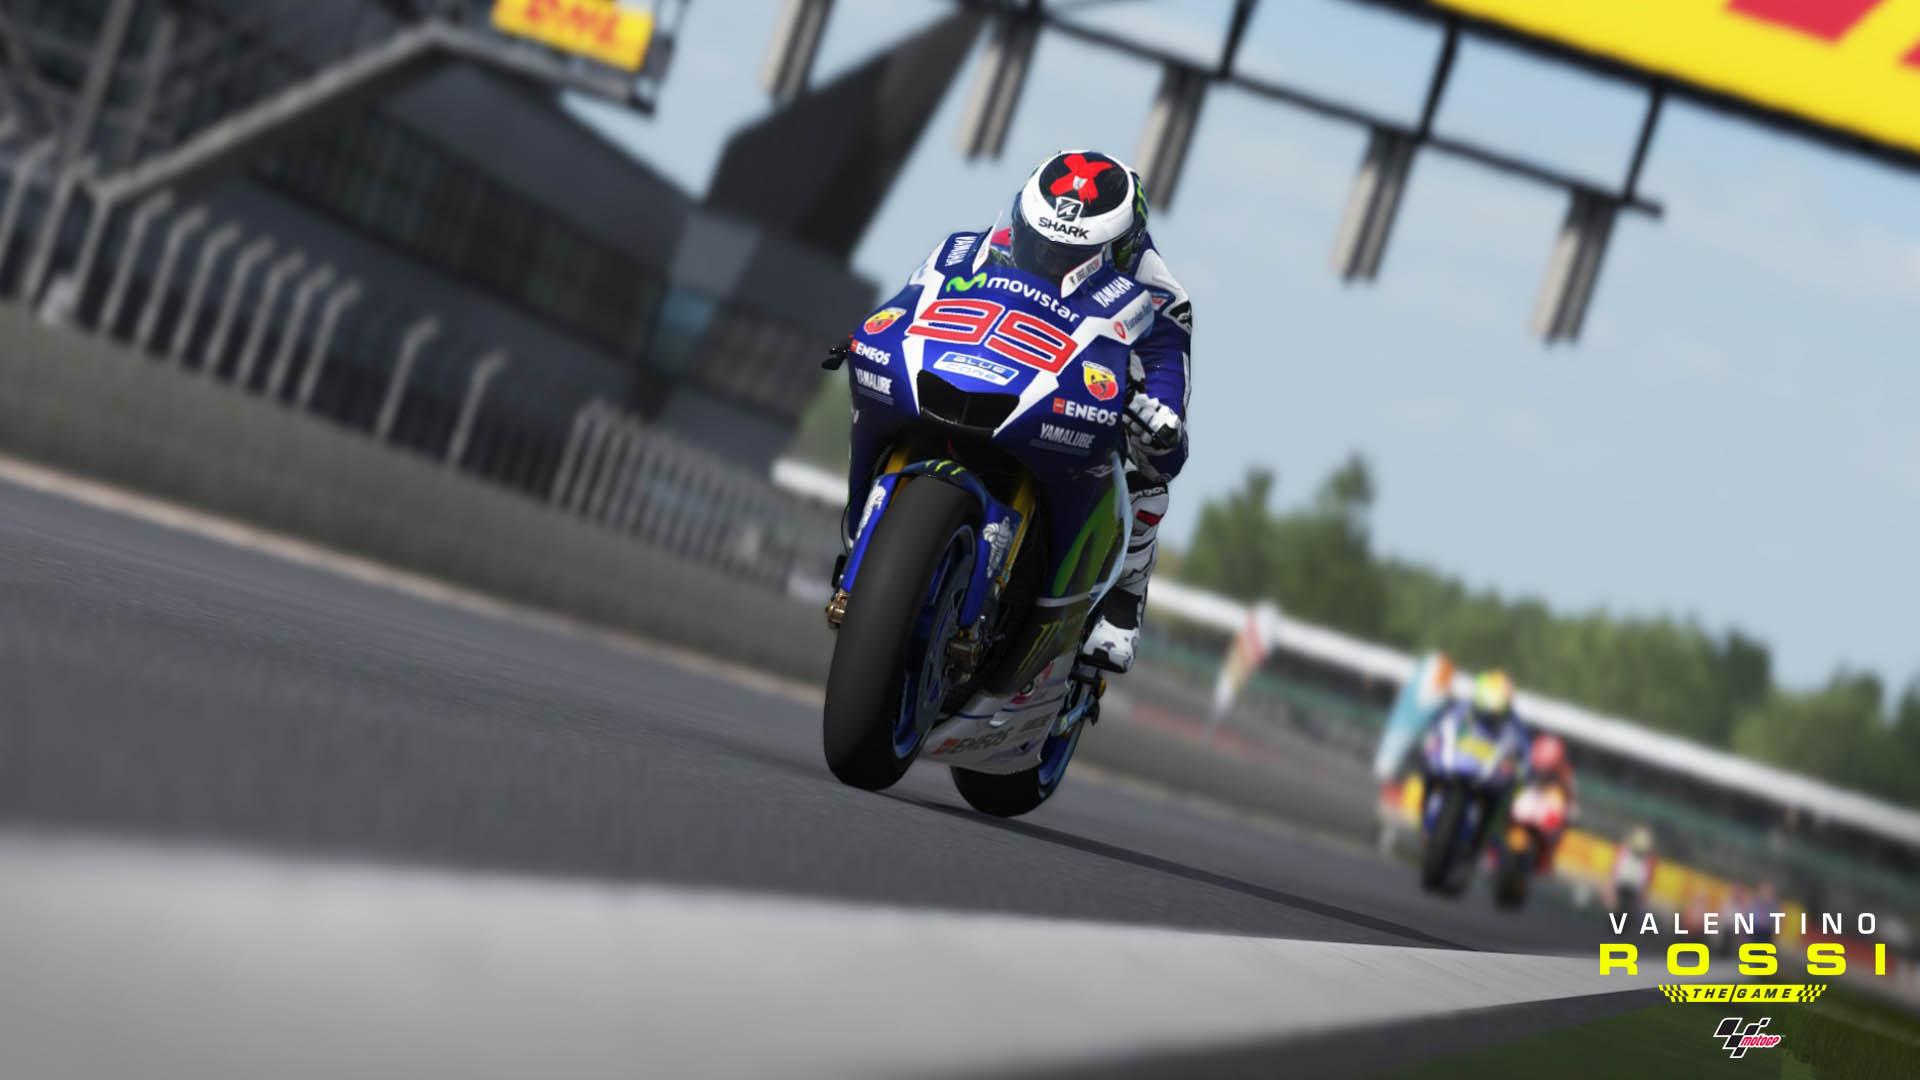 Real Events 2: 2016 MotoGP Season screenshot